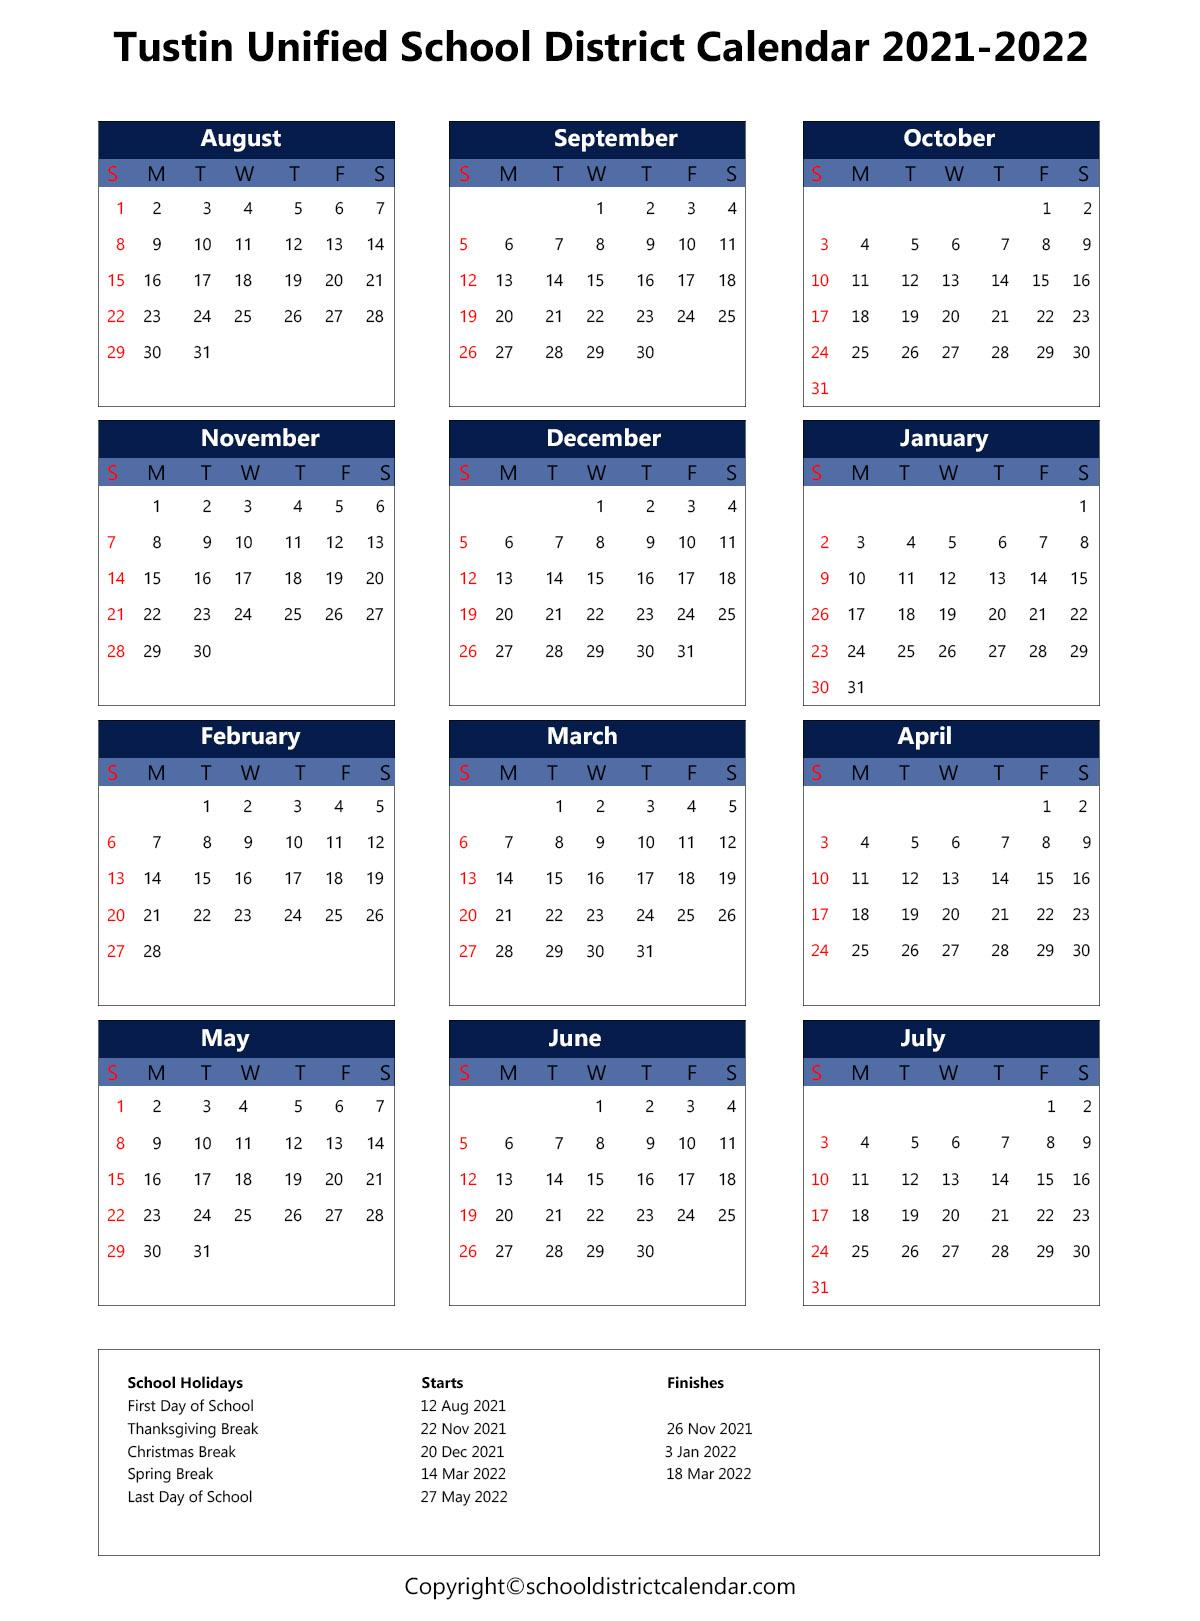 Tustin Unified School District Calendar 2021